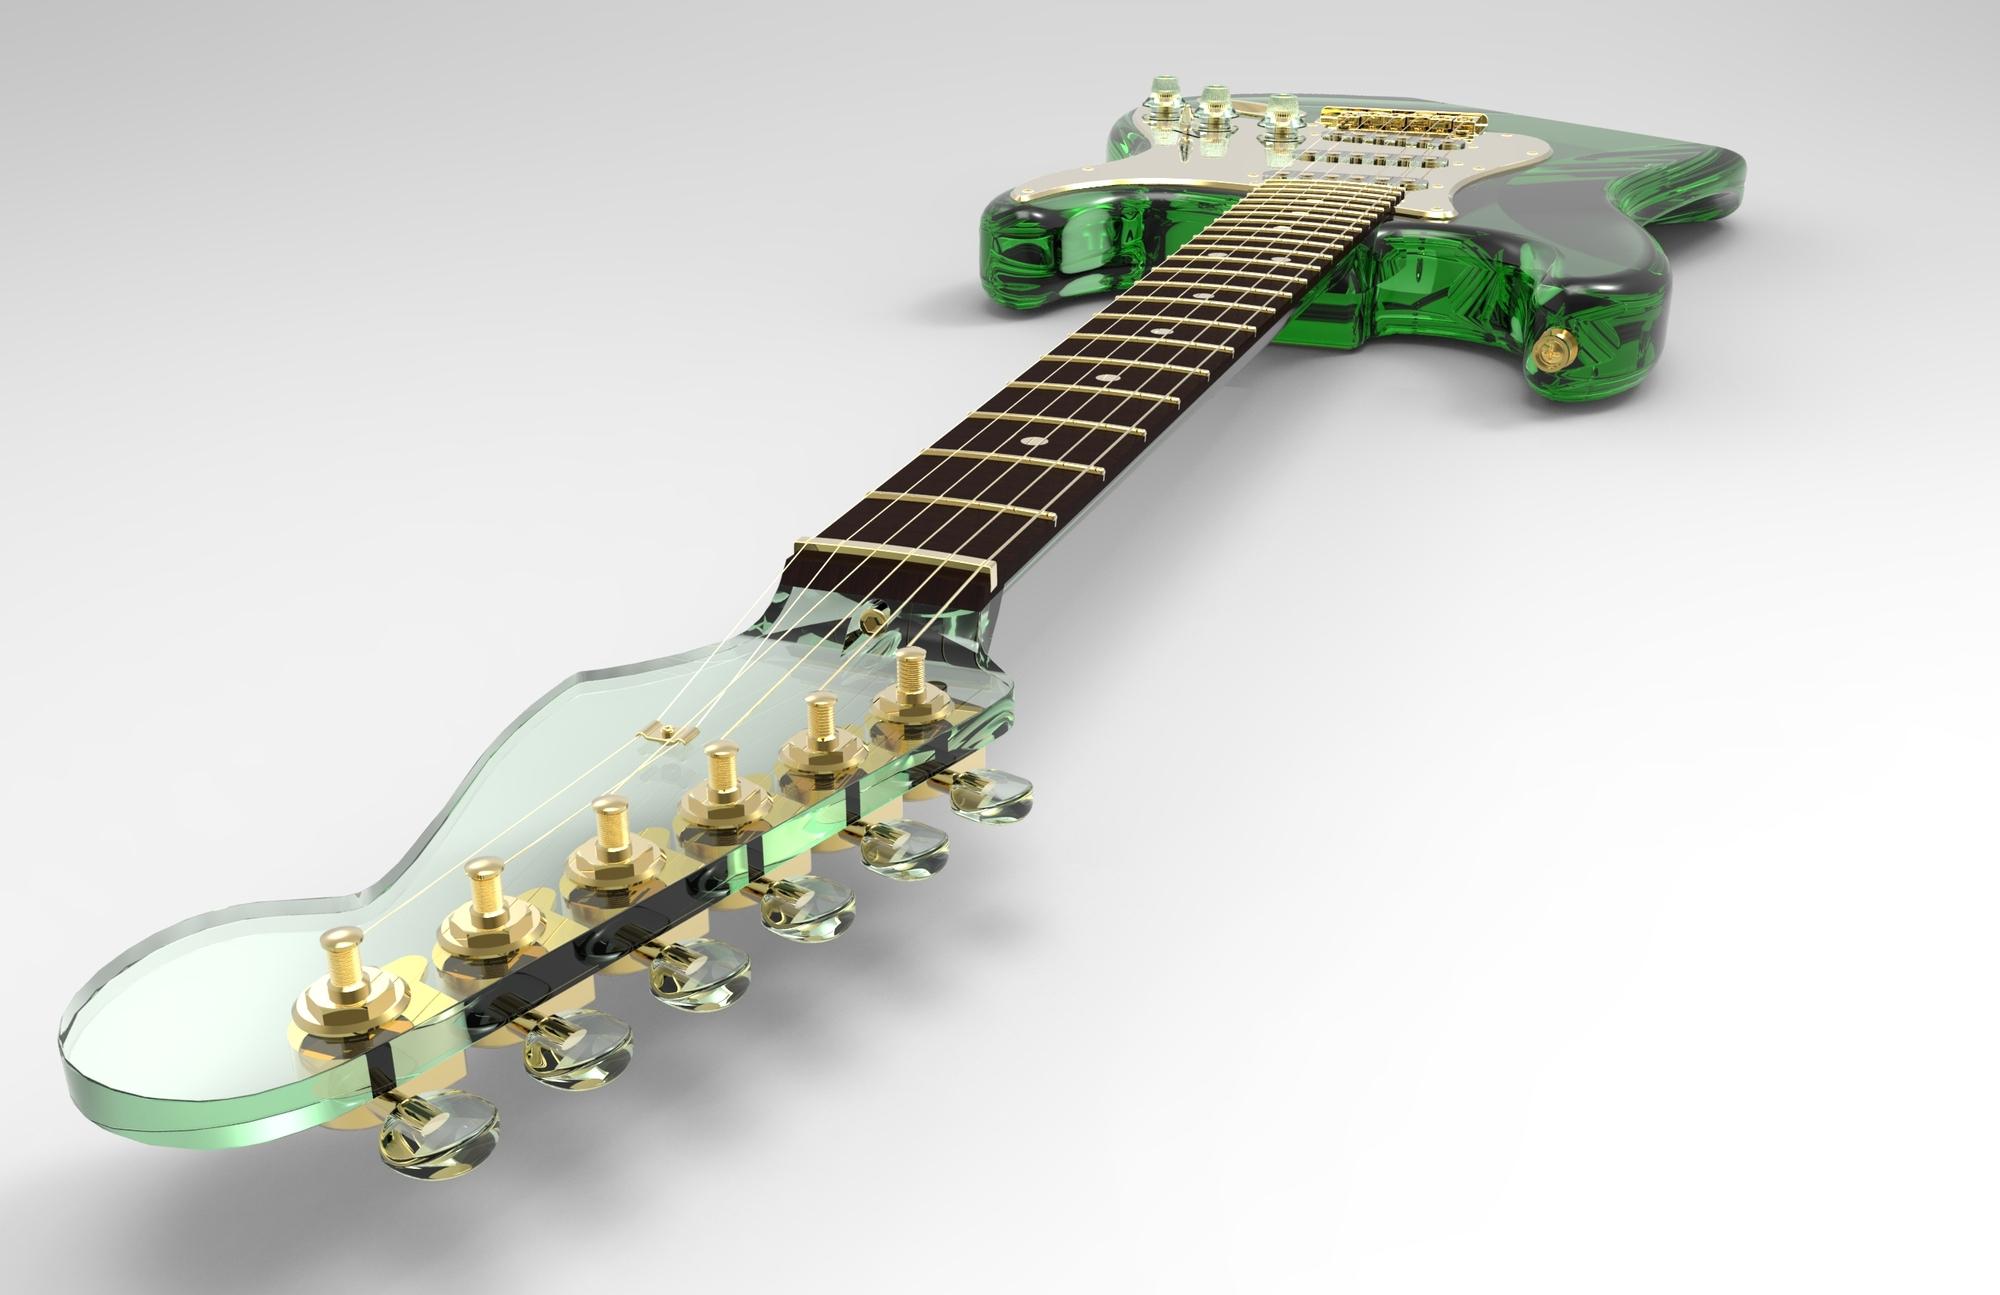 Fender_strat_2